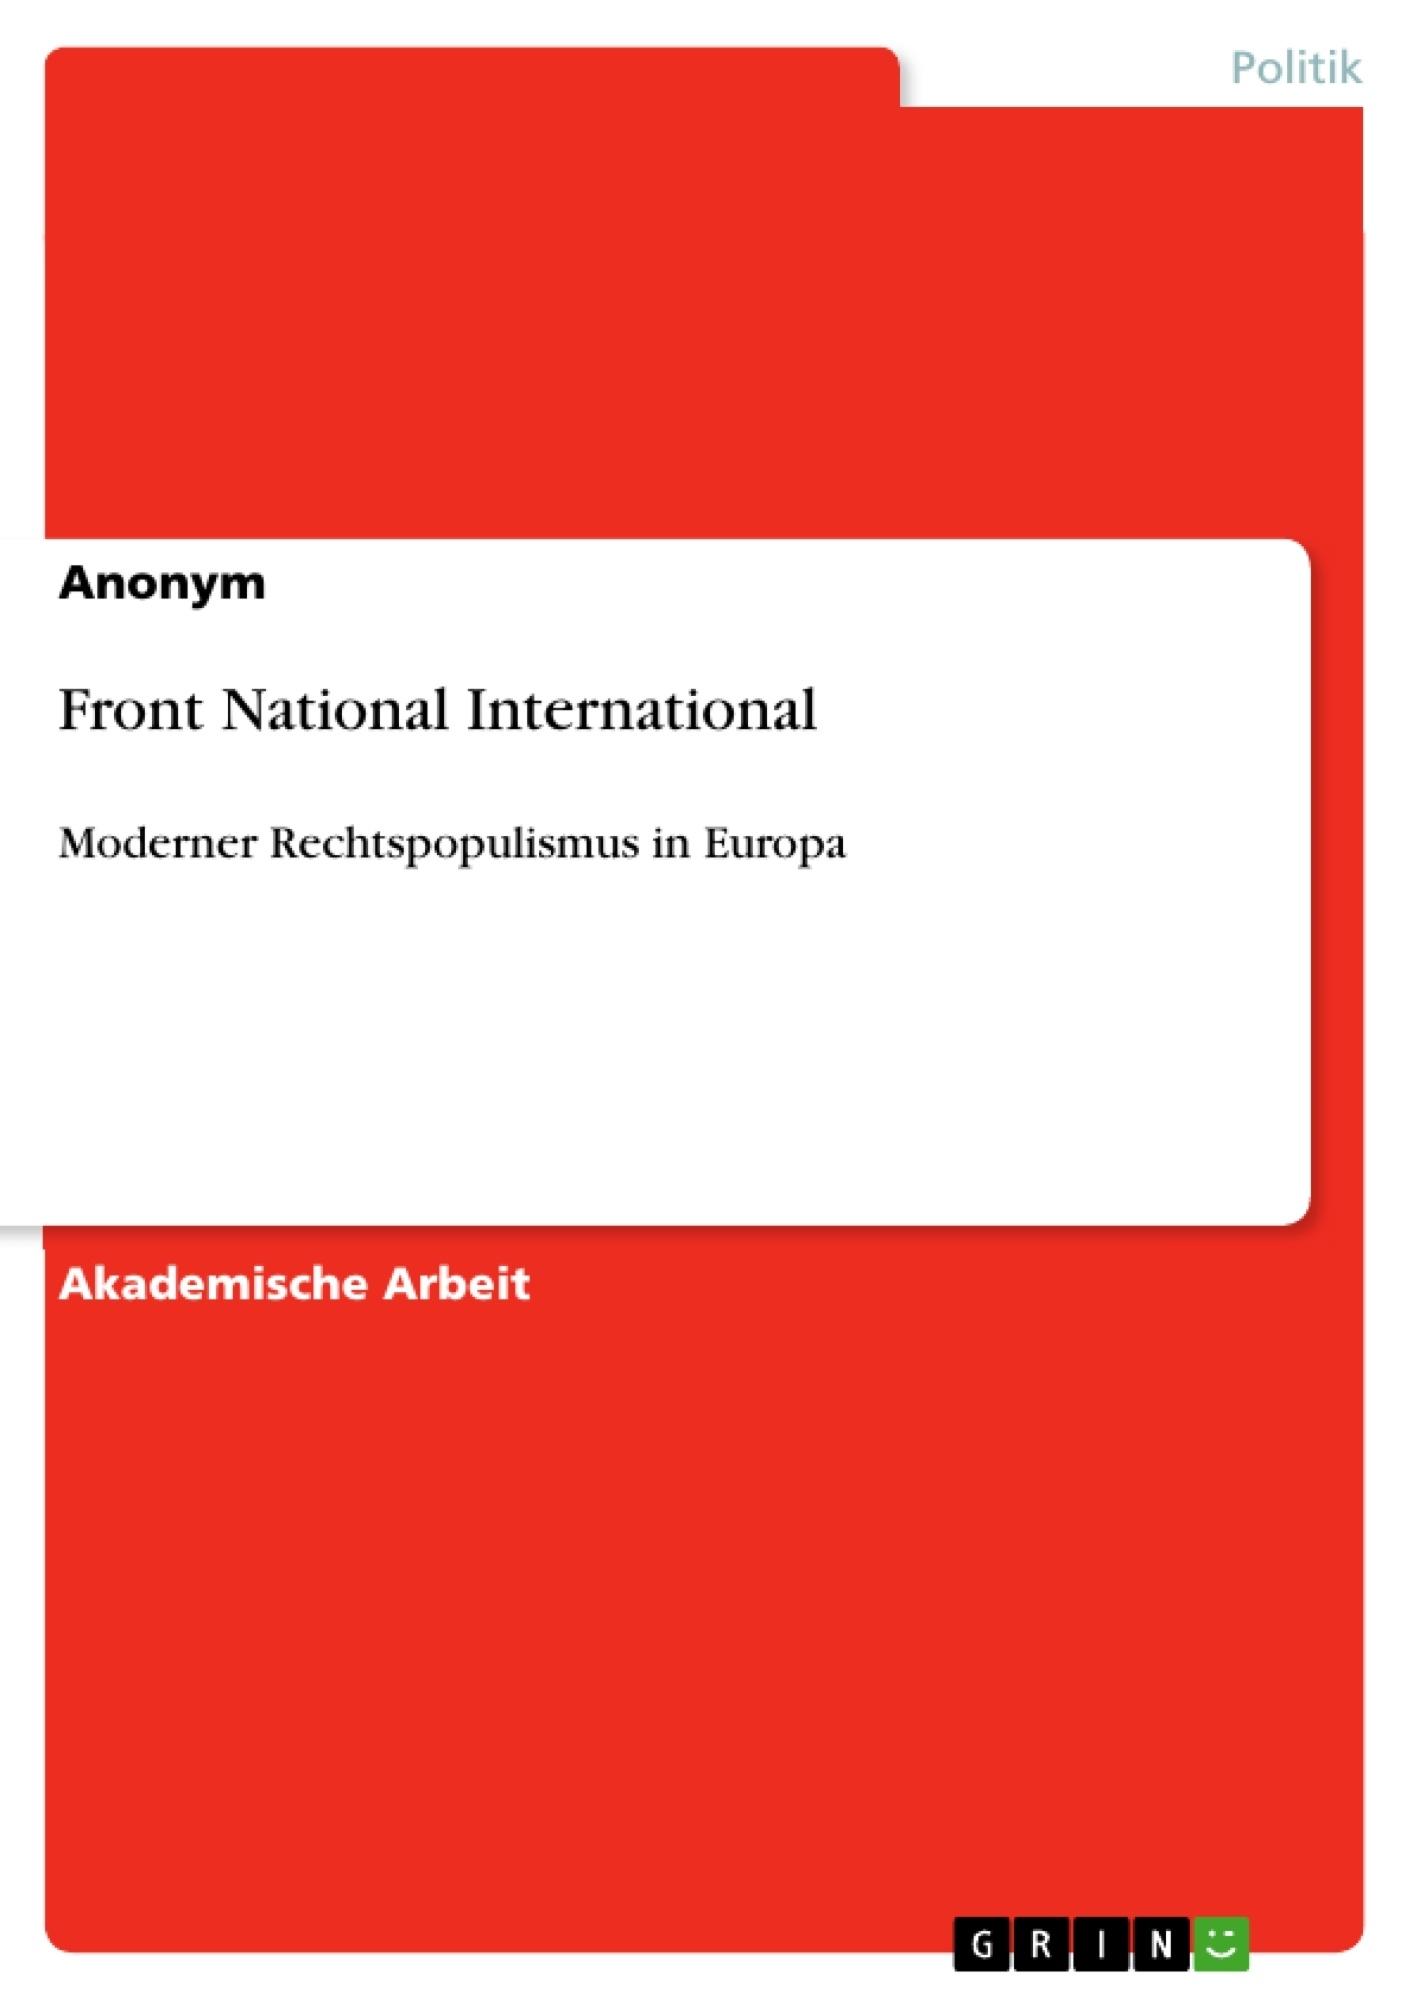 Titel: Front National International